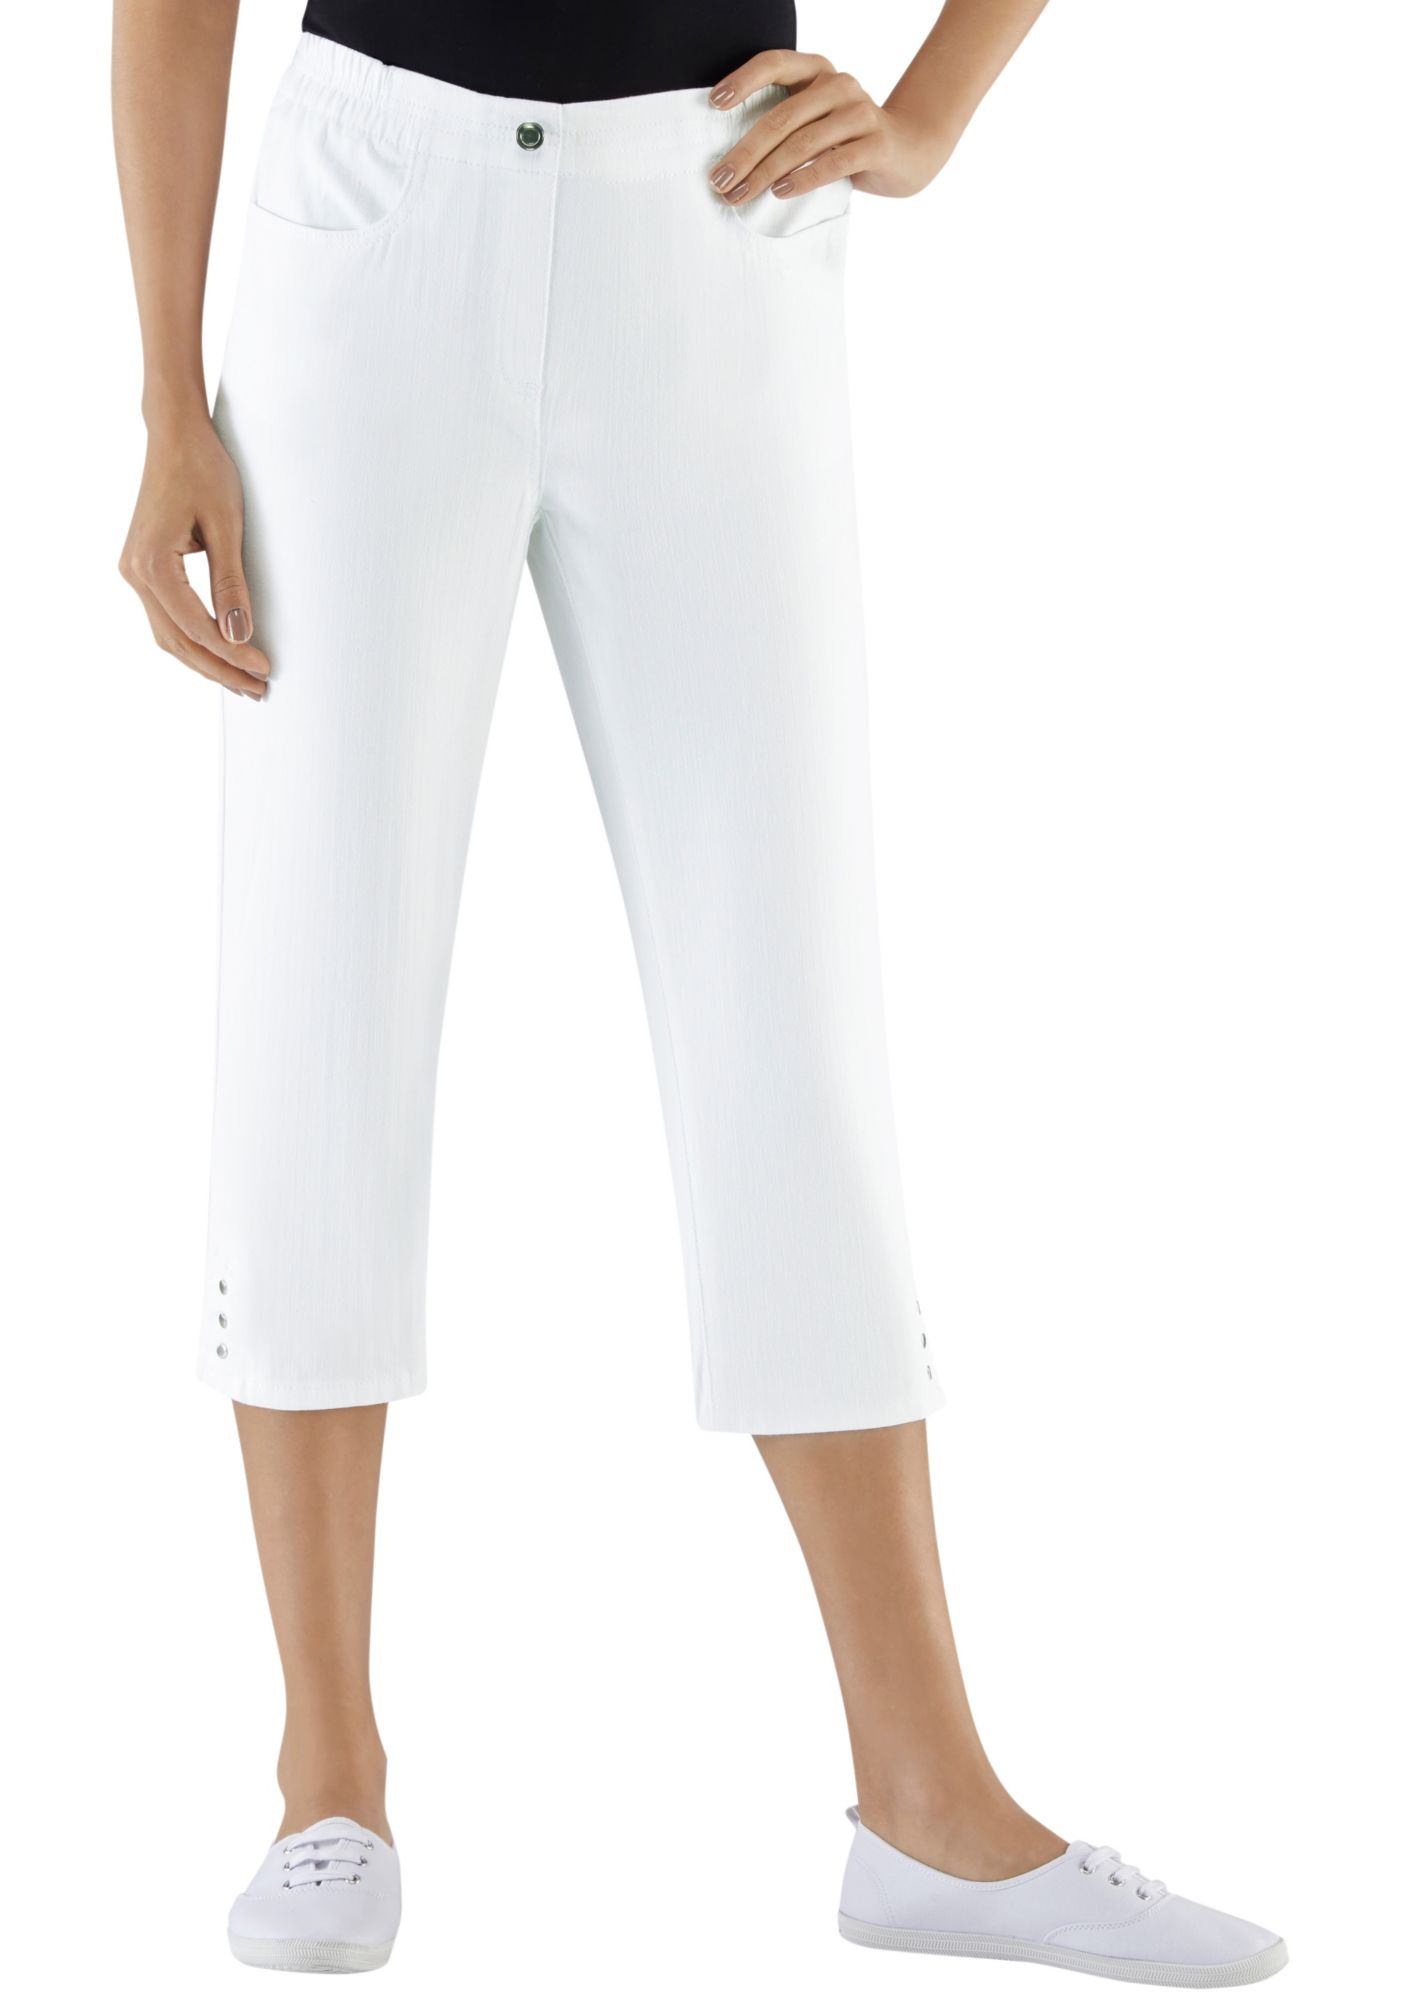 CLASSIC BASICS Classic Basics Capri-Jeans mit Rundum-Dehnbund